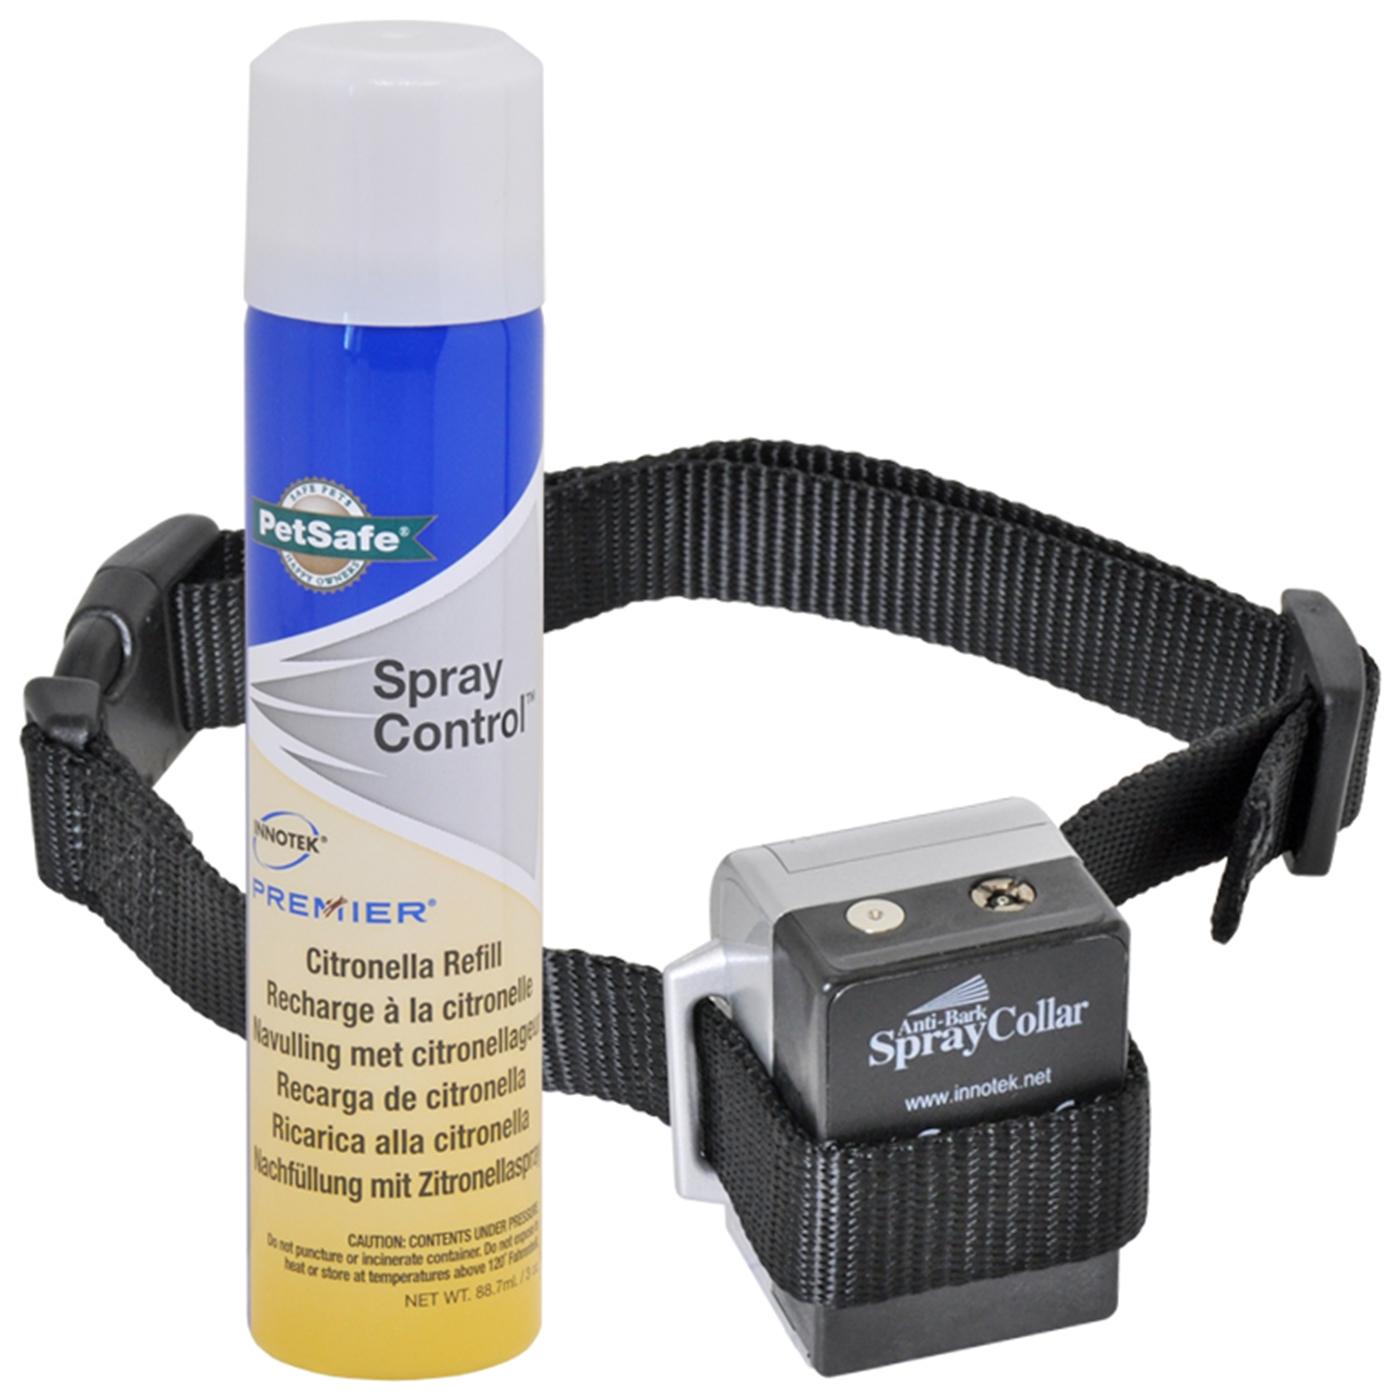 petsafe citrus antibell halsband sprayhalsband. Black Bedroom Furniture Sets. Home Design Ideas